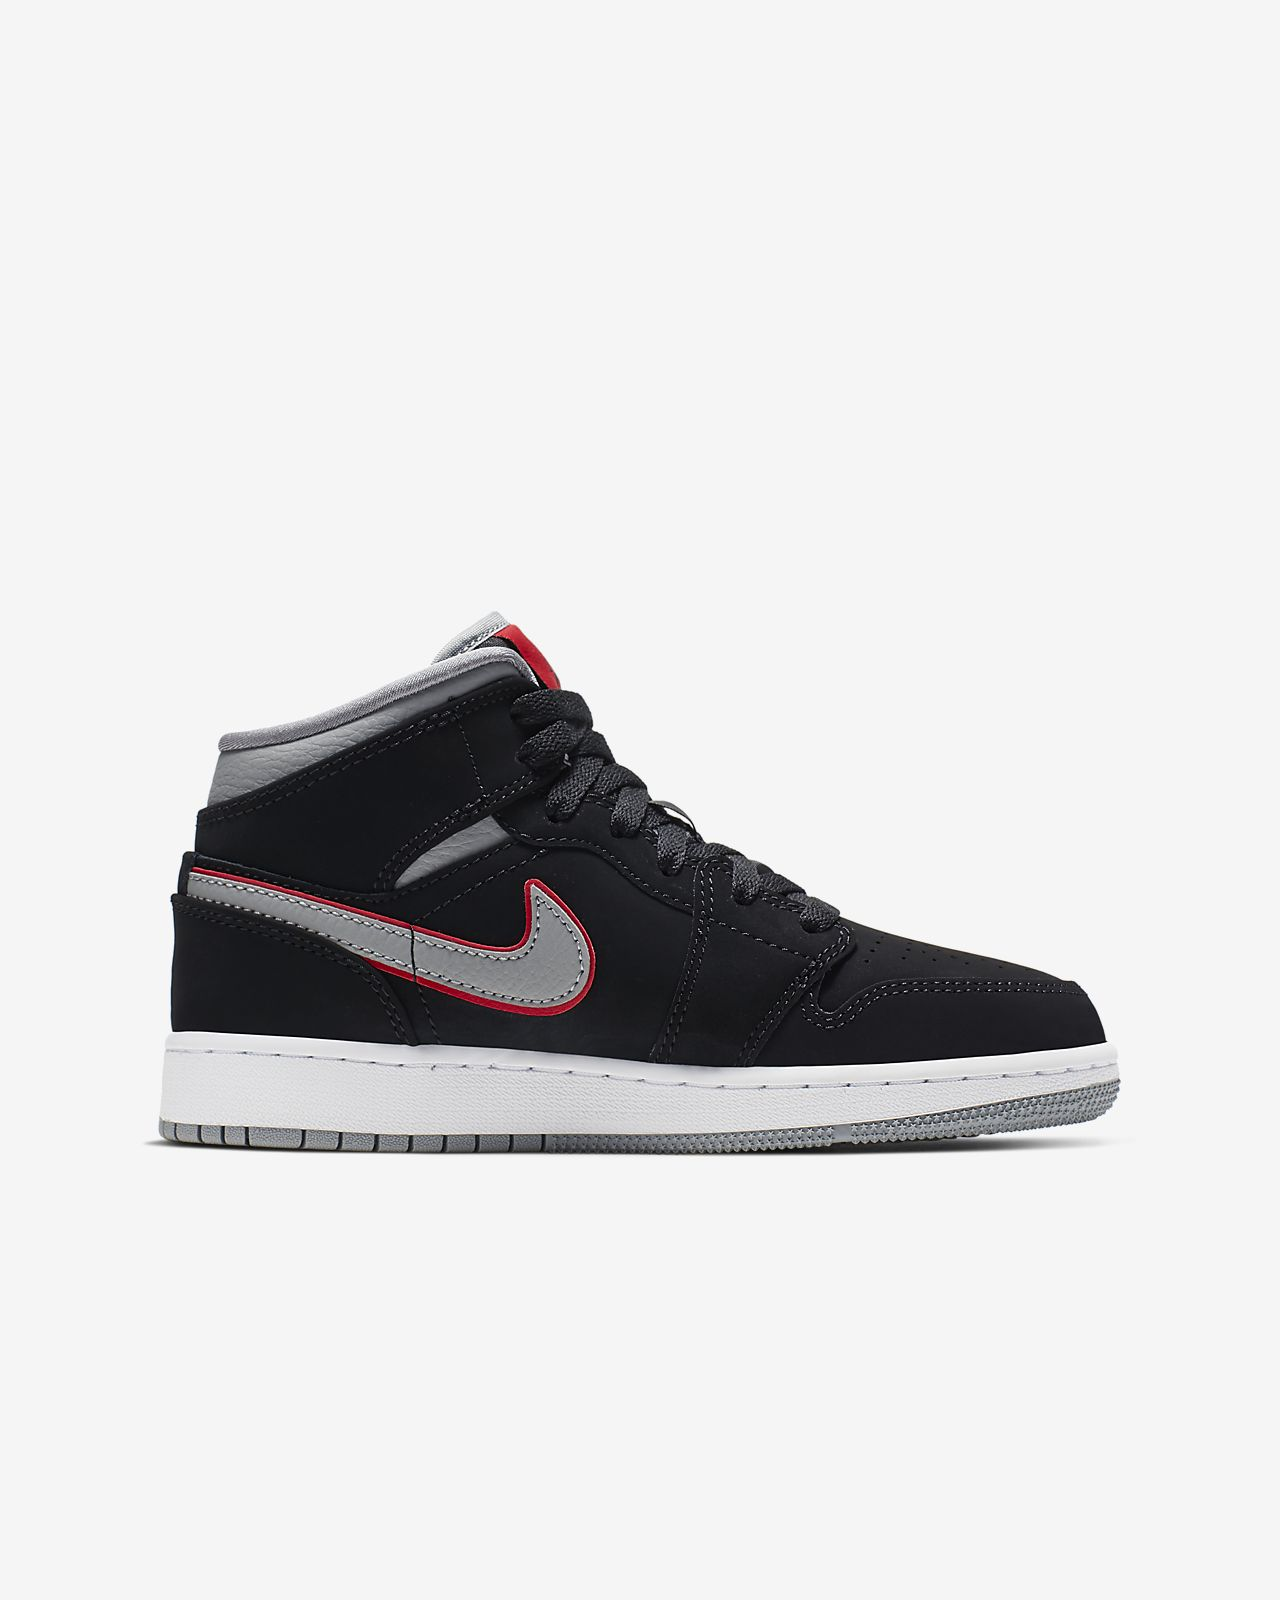 huge discount 457f0 8aebb ... Air Jordan 1 Mid Schuh für ältere Kinder